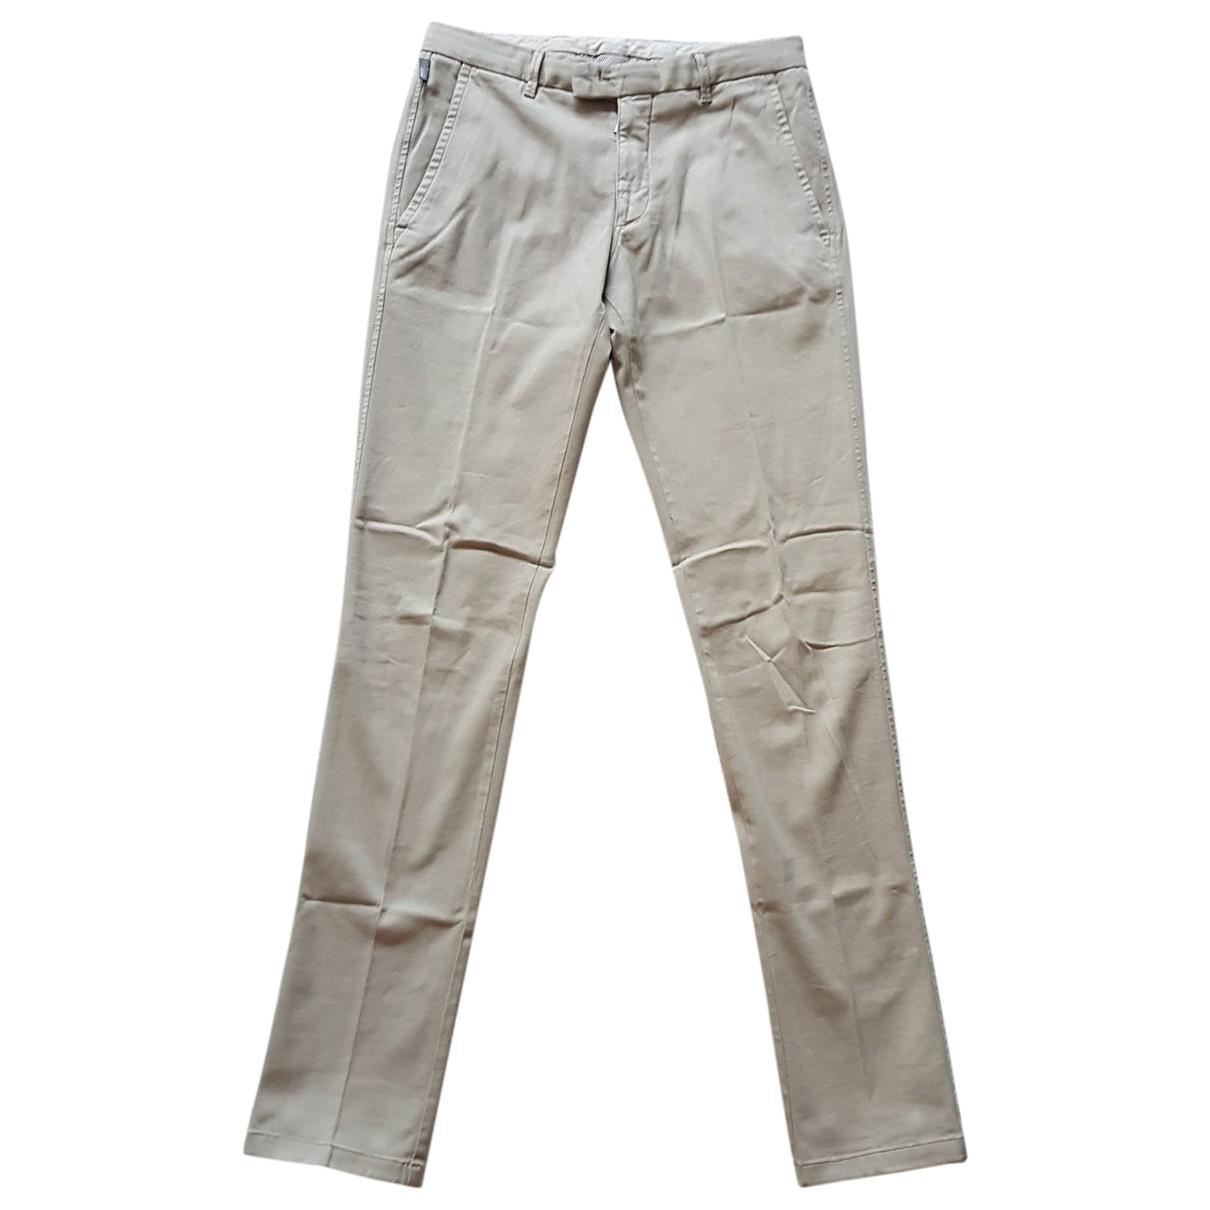 Pantalones en Algodon Beige Armani Collezioni